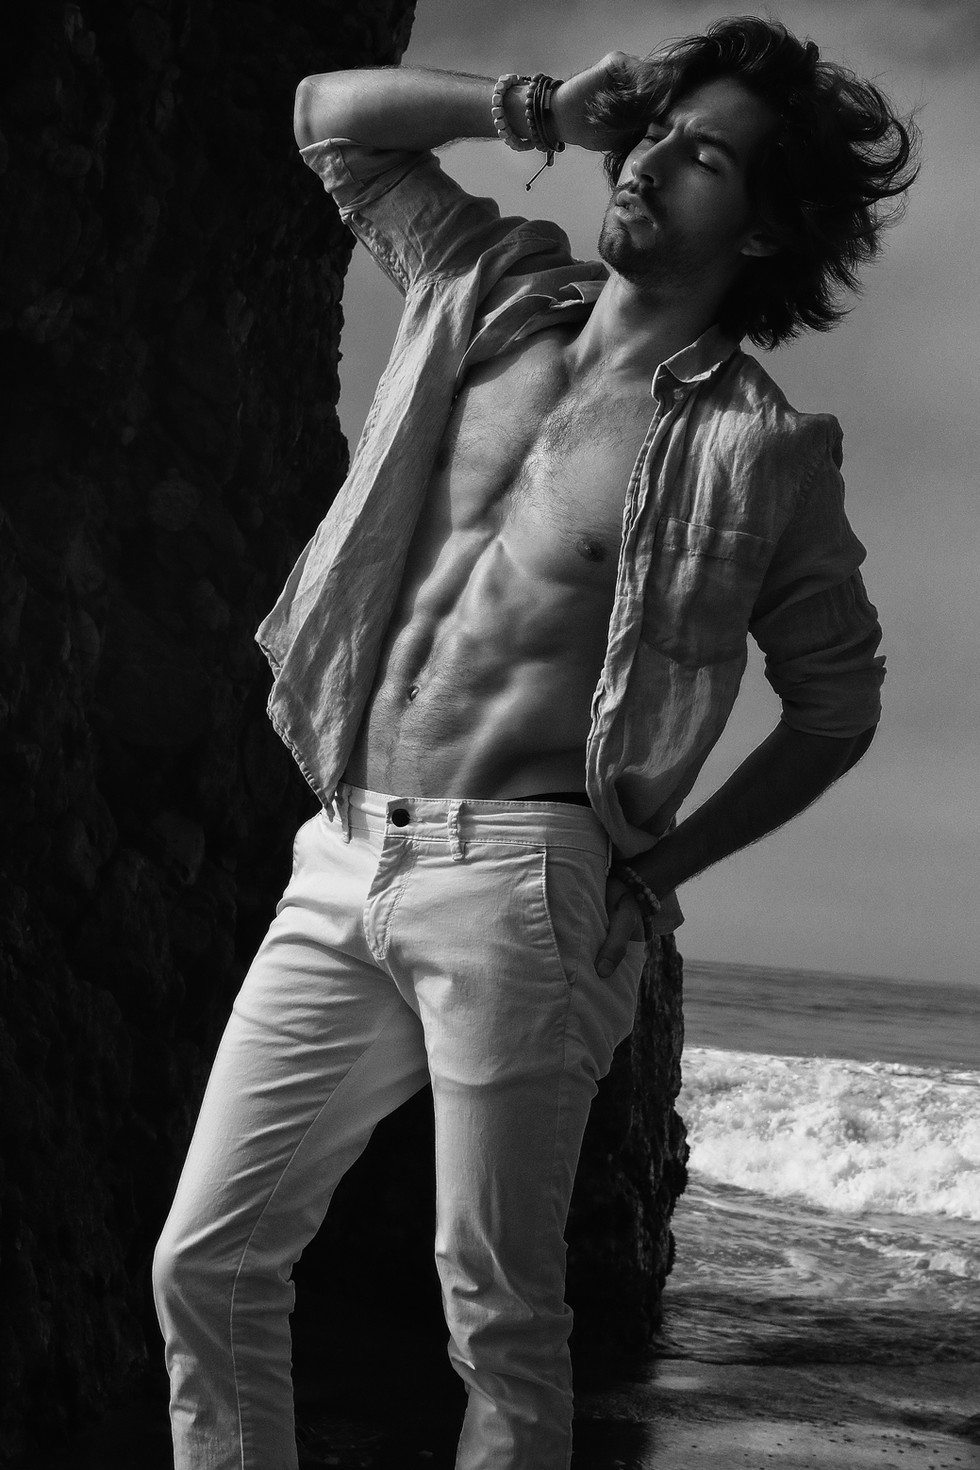 Nick Bracewell